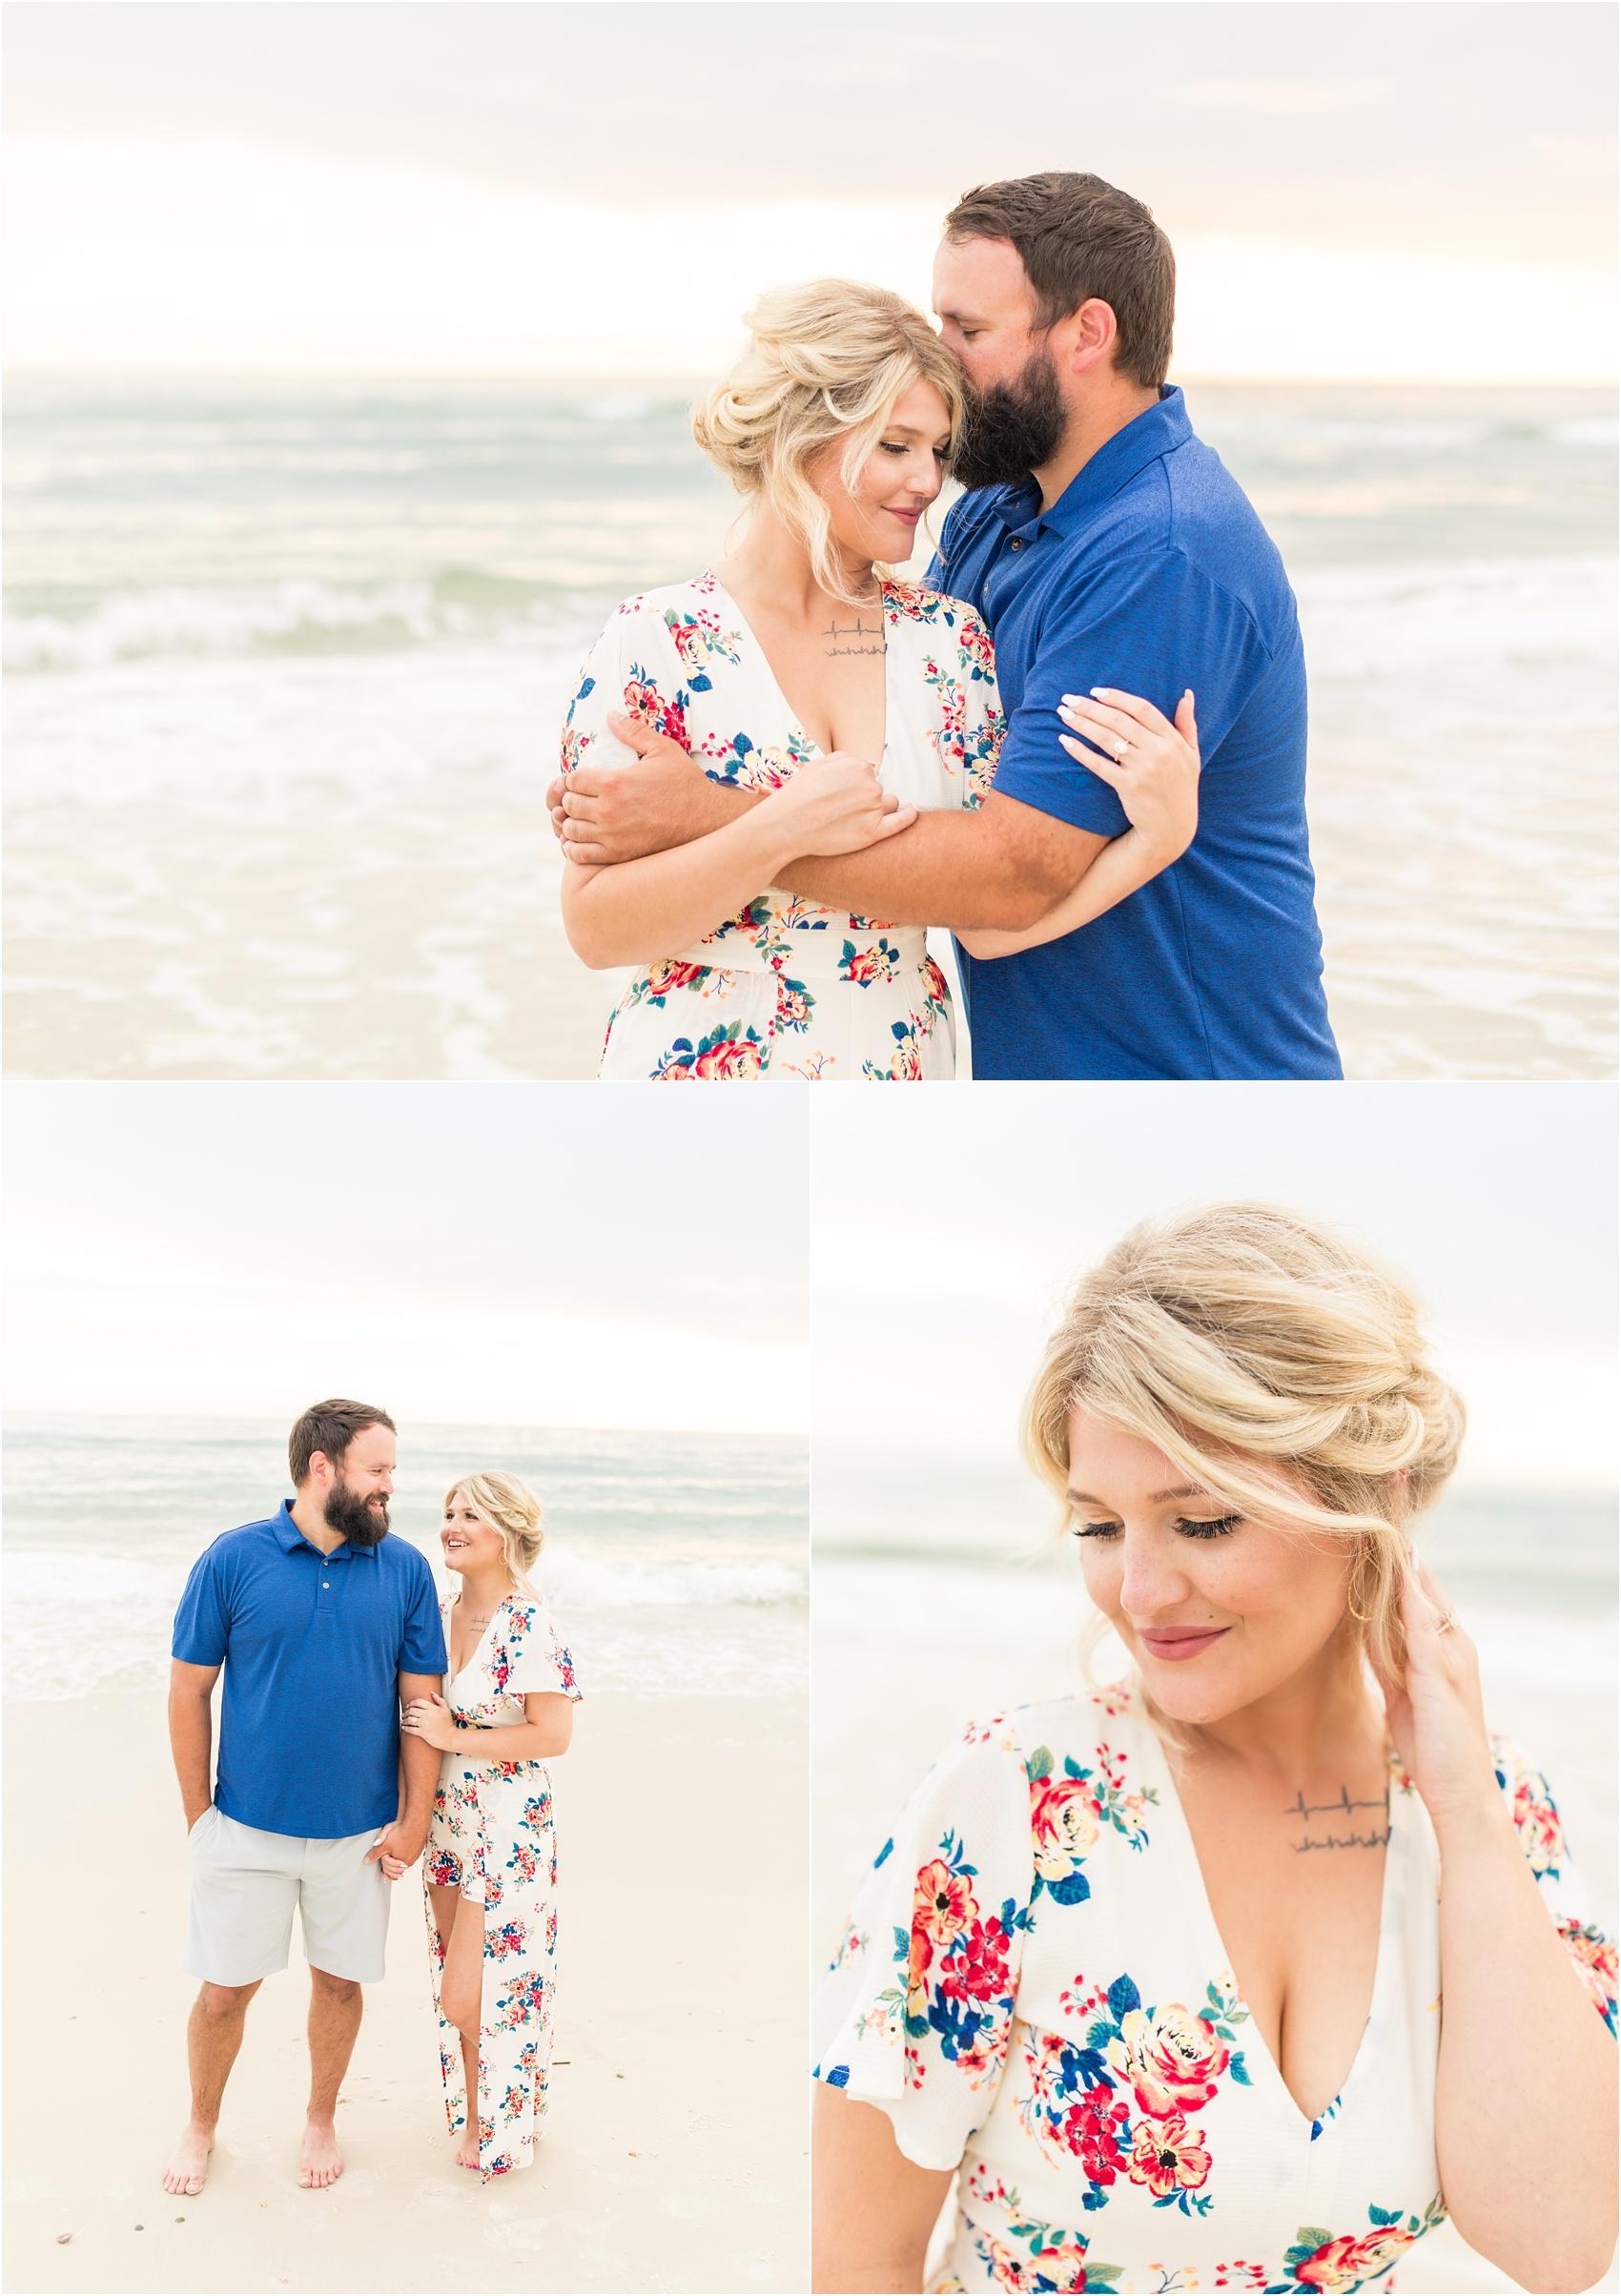 Savannah Eve Photography- Madison & Tim's Engagements-13.jpg